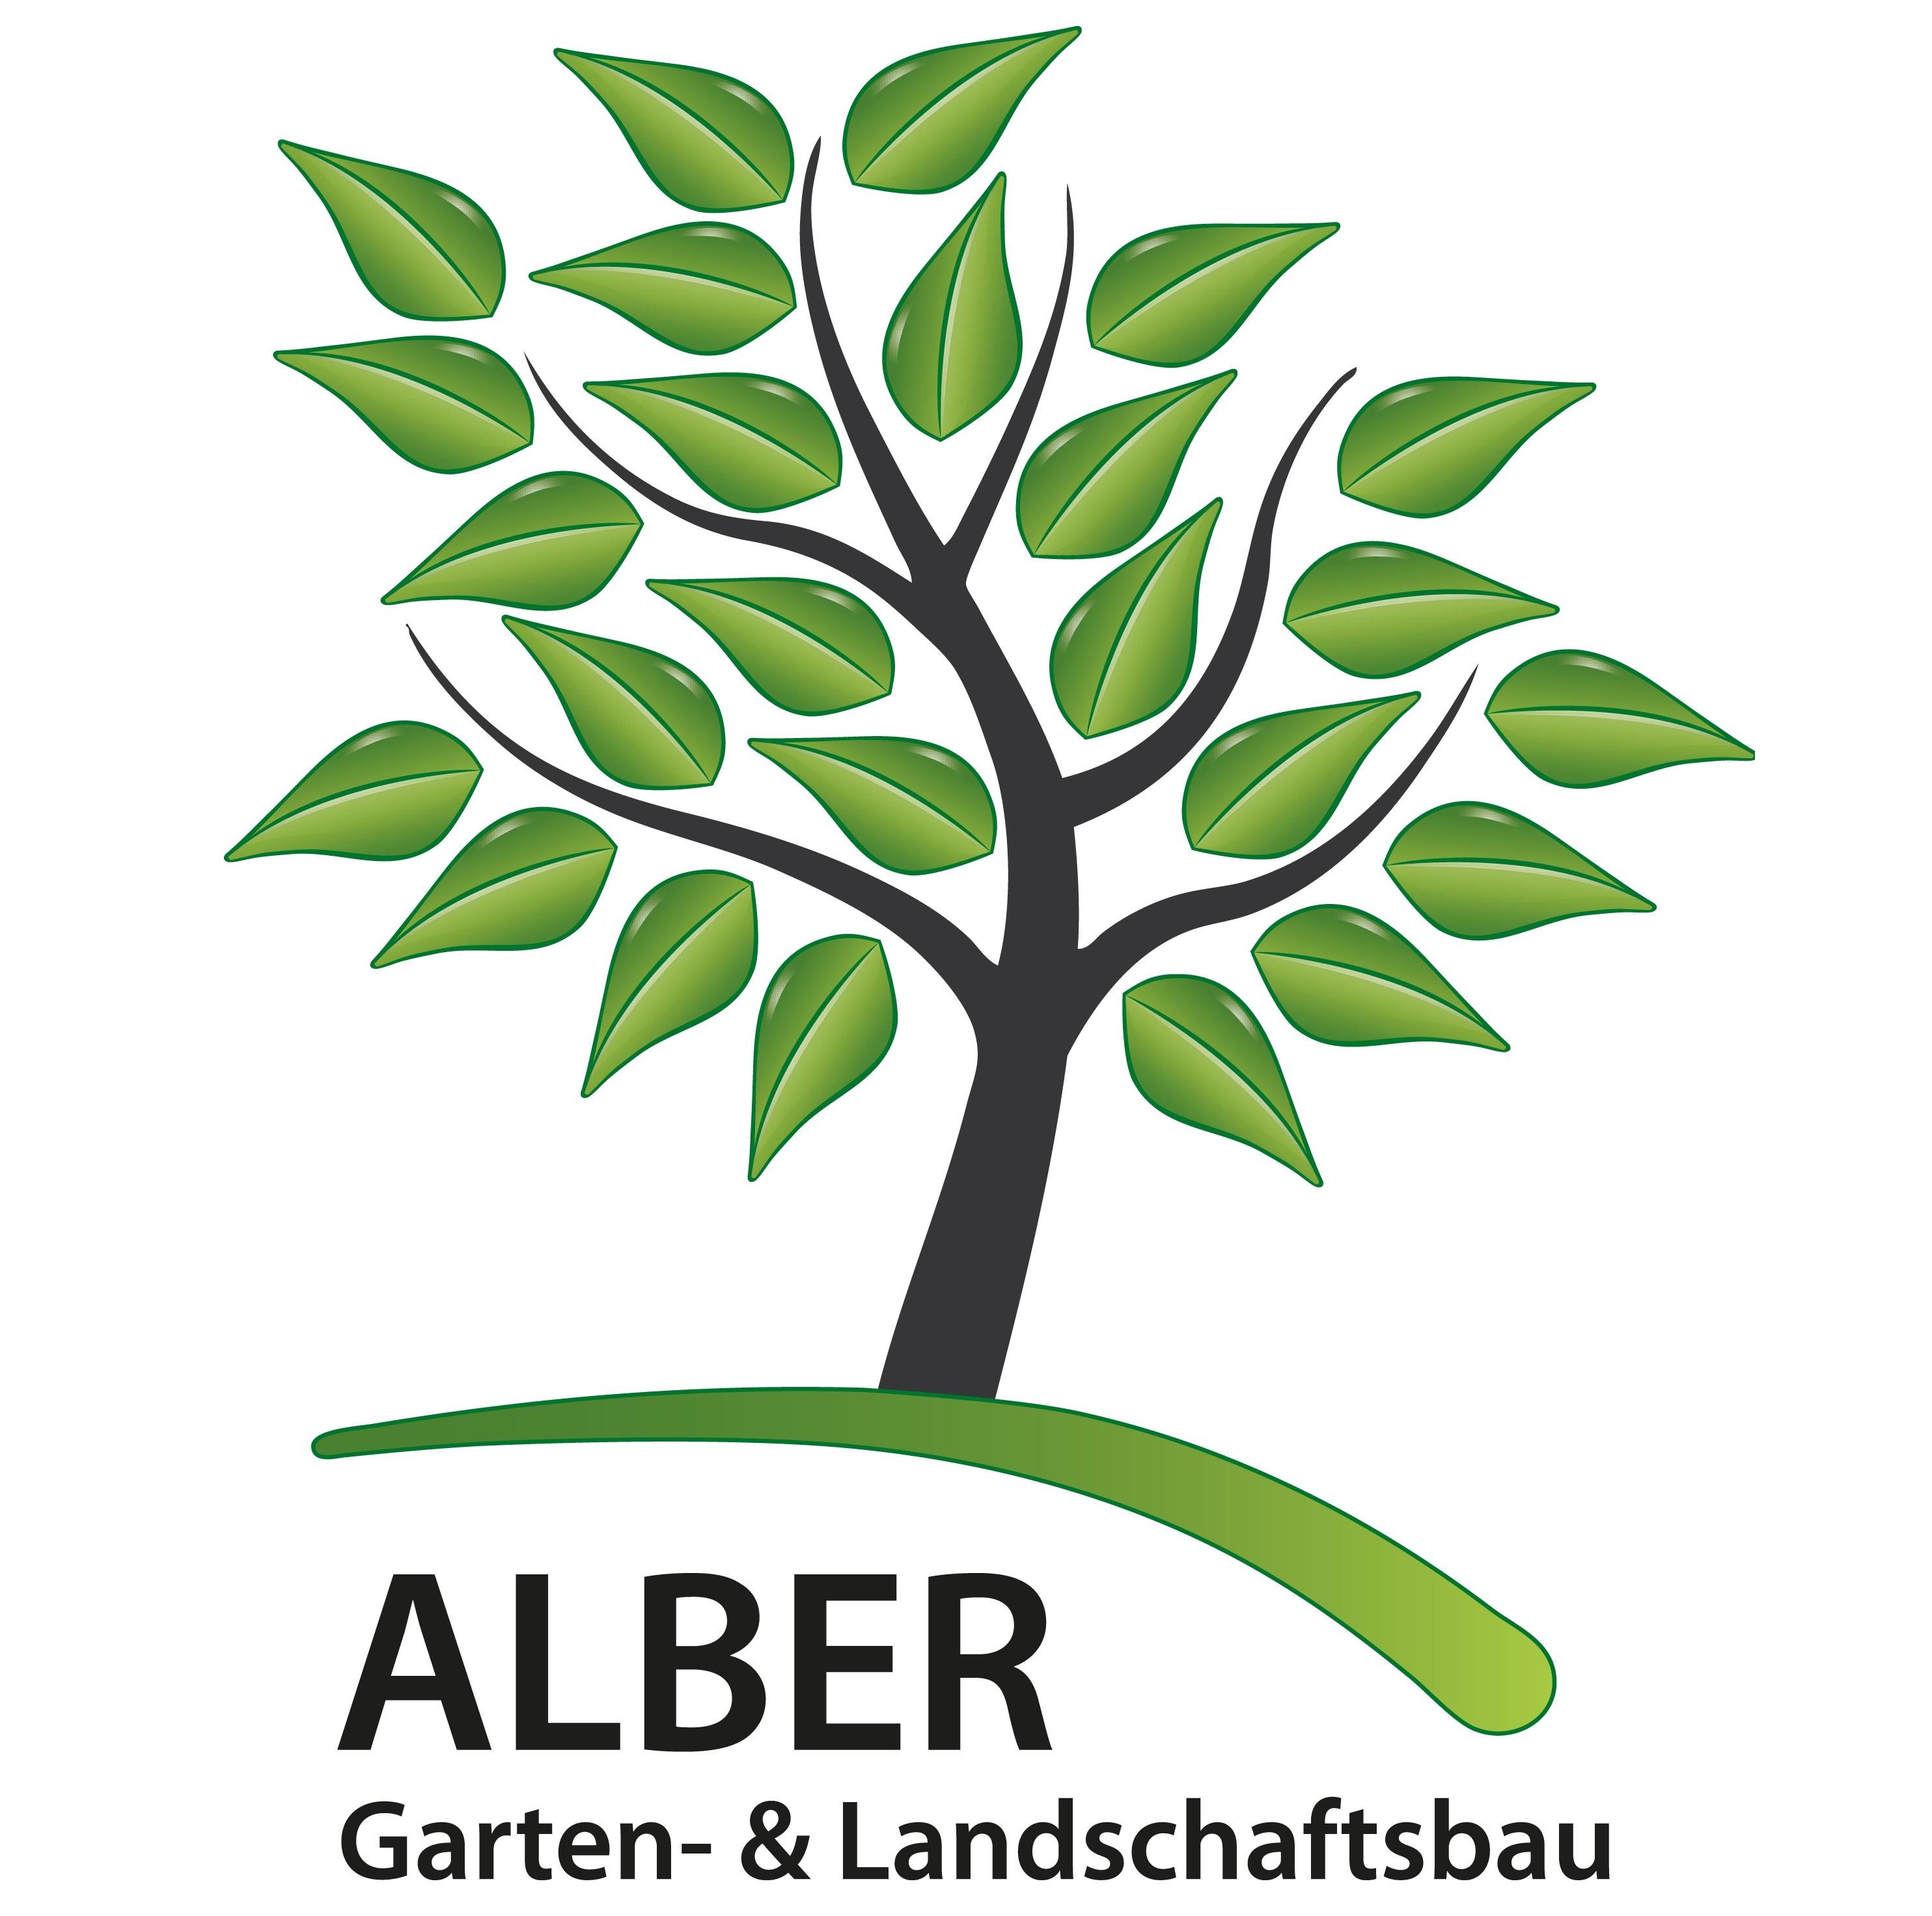 Alber garten landschaftsbau nagold kontaktieren for Garten landschaftsbau